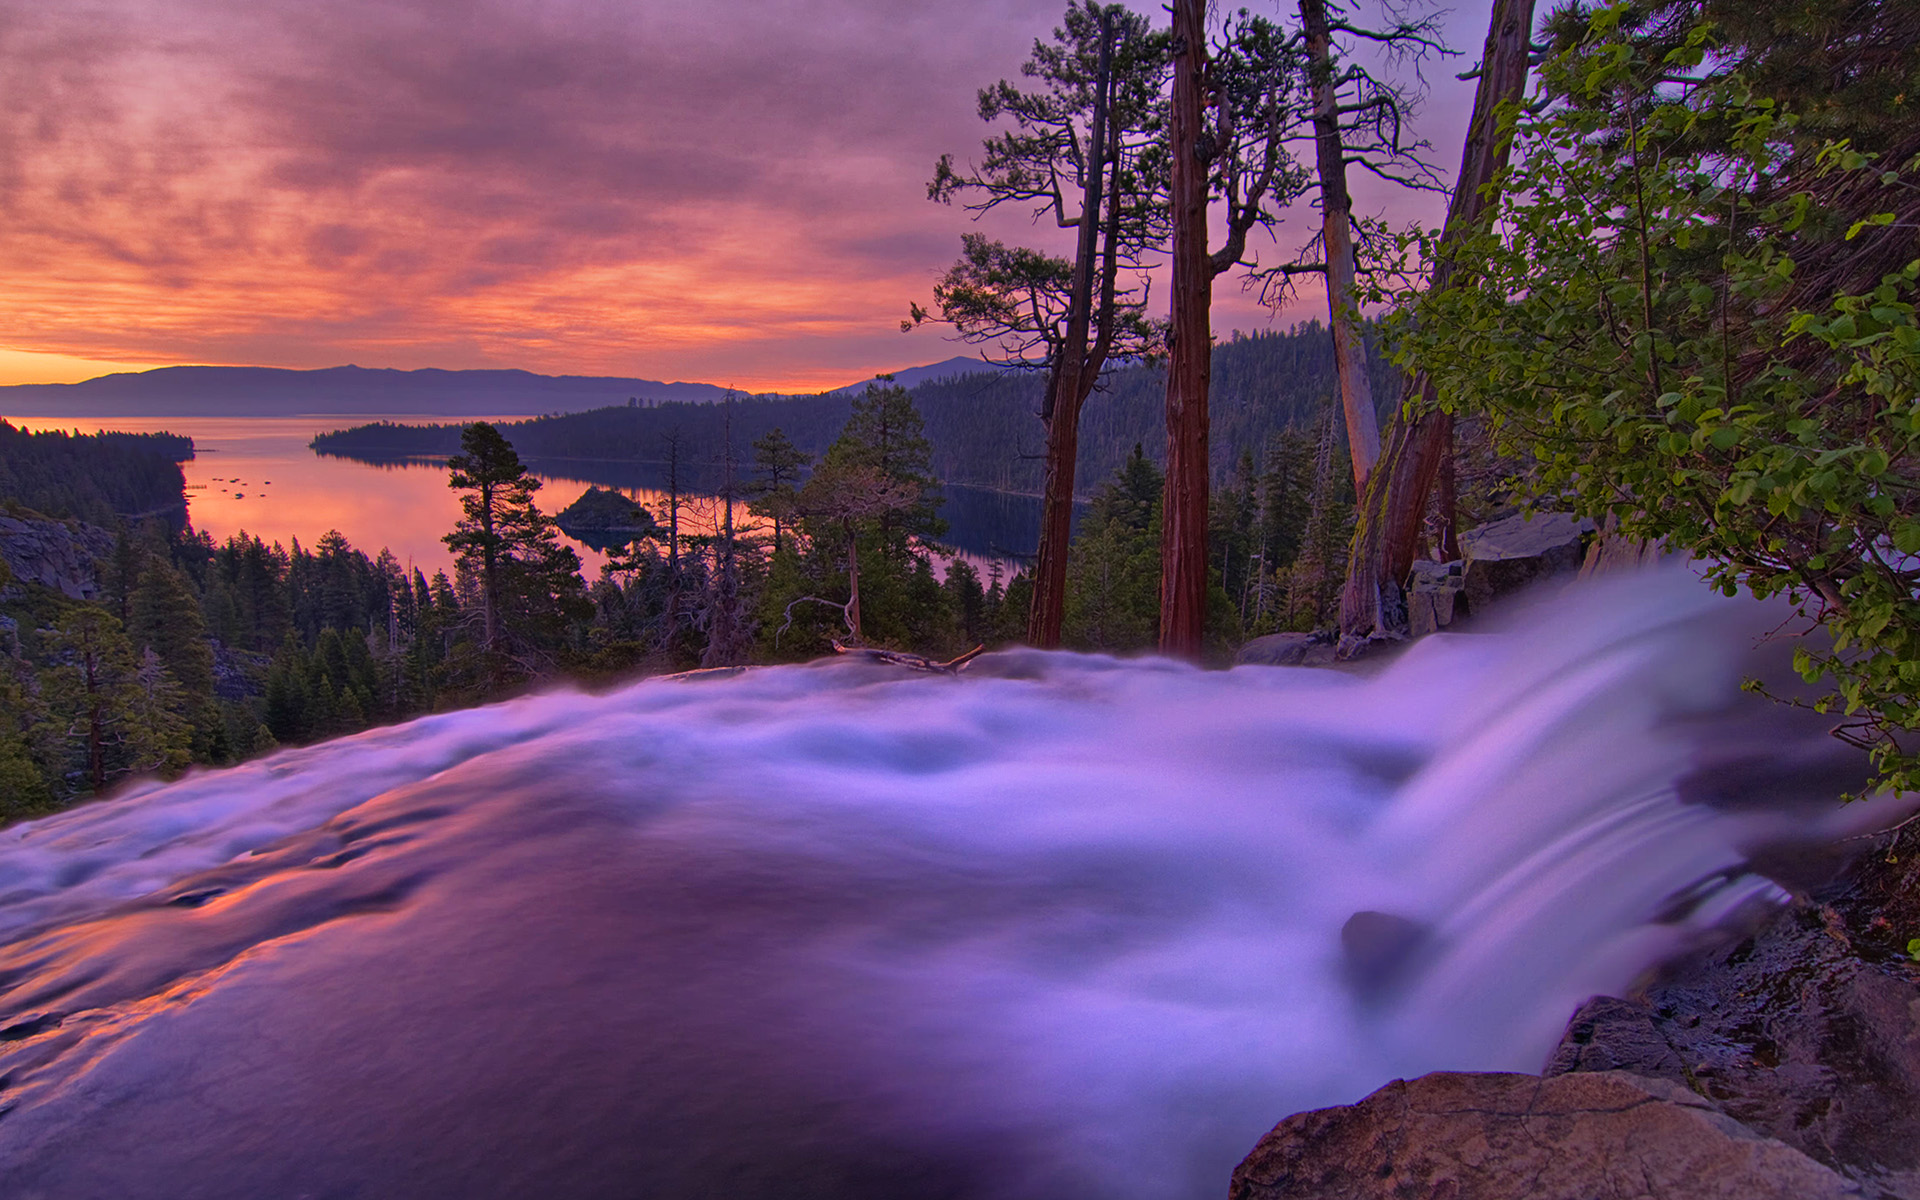 Fall Hd Wallpapers For Mac Eagle Falls And Emerald Bay At Sunrise At Lake Tahoe In